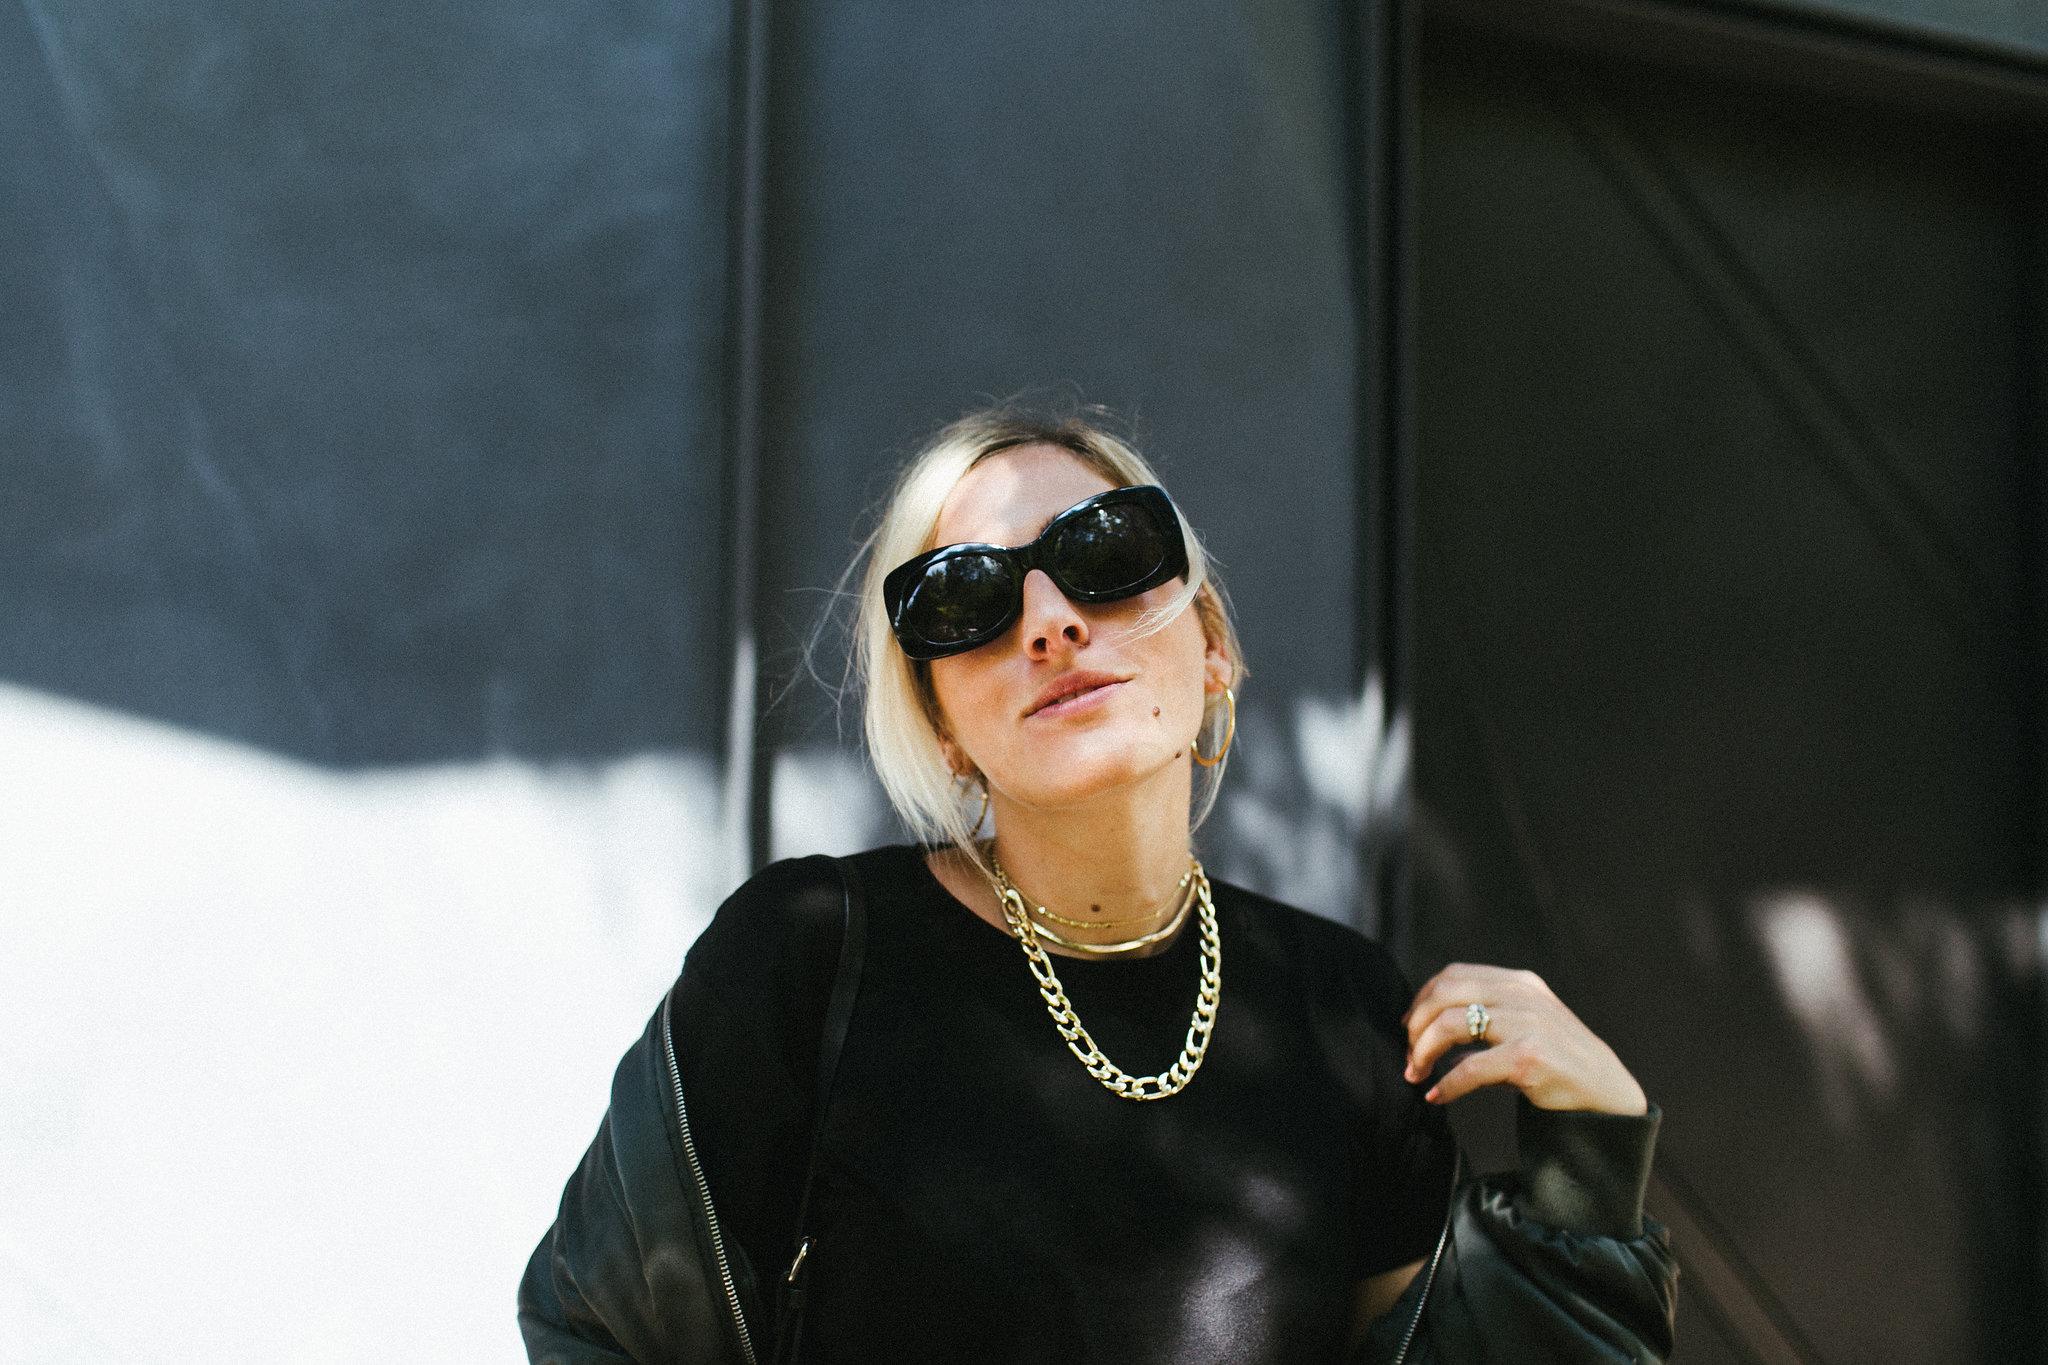 Paige-Newton-Austin-Blogger-Photography-Fashion0002.jpg